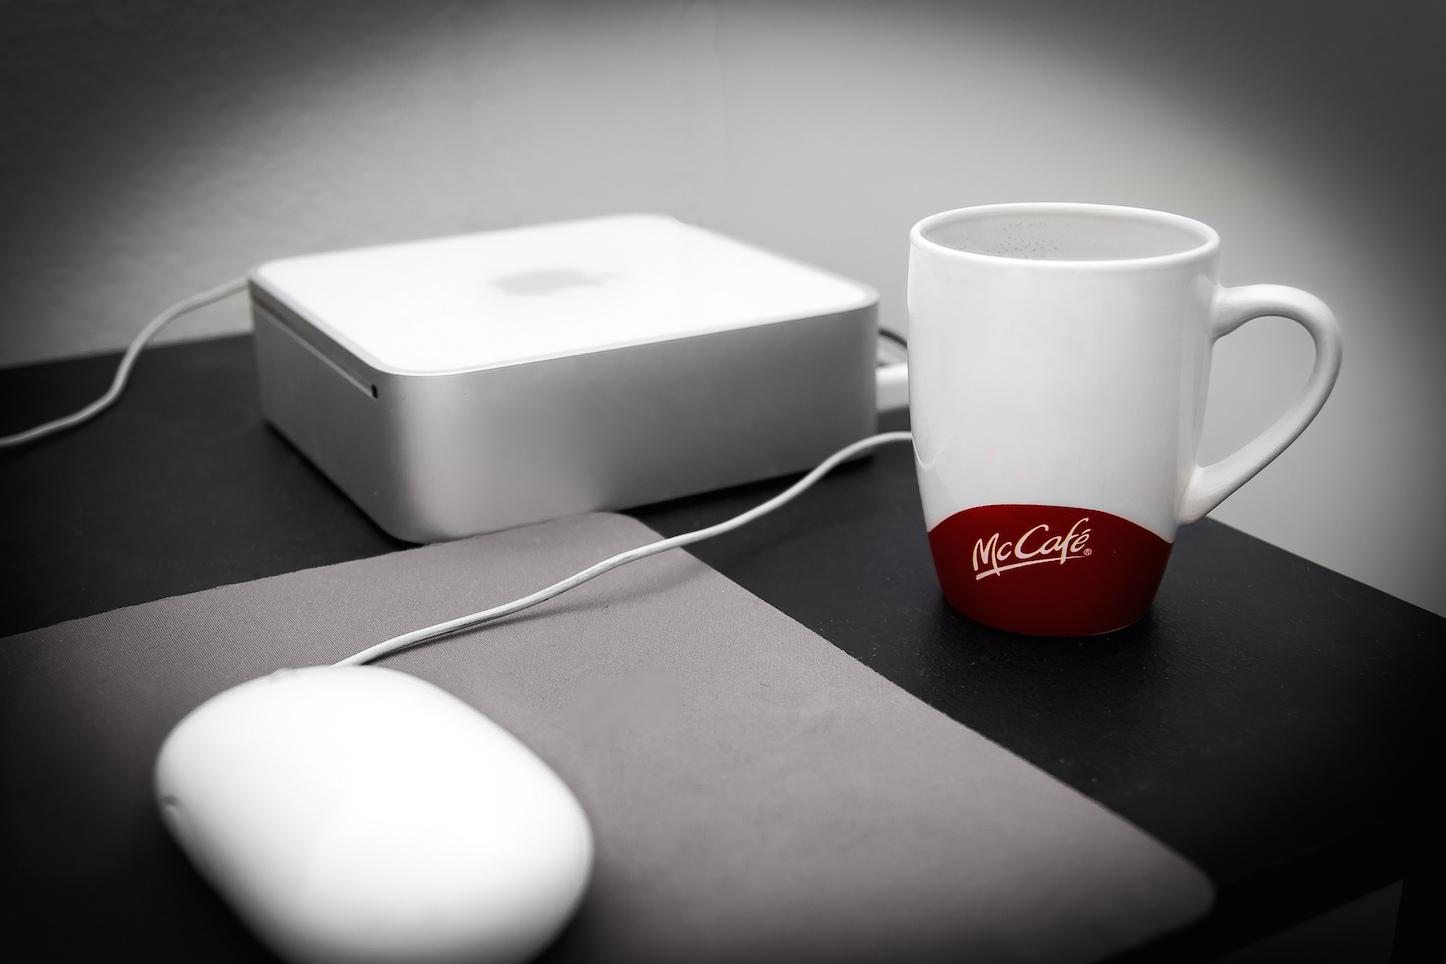 Mac mini macdonalds